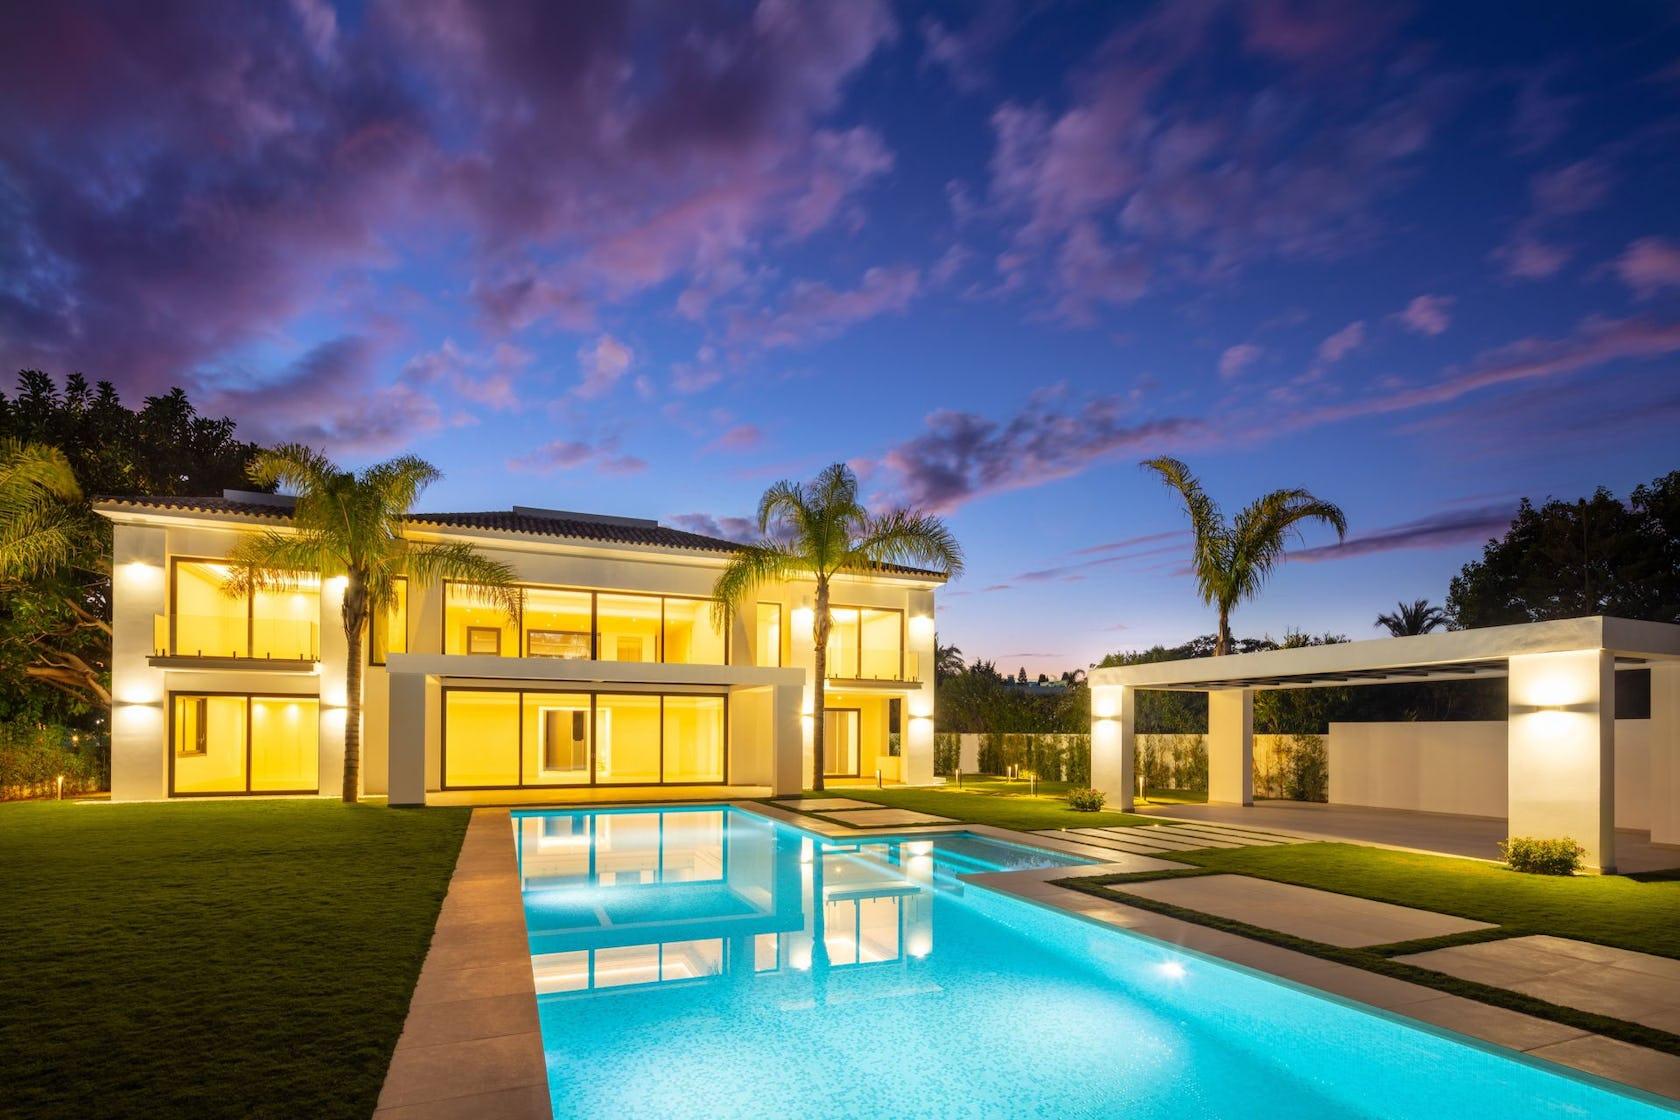 villa housing building house pool water mansion swimming pool